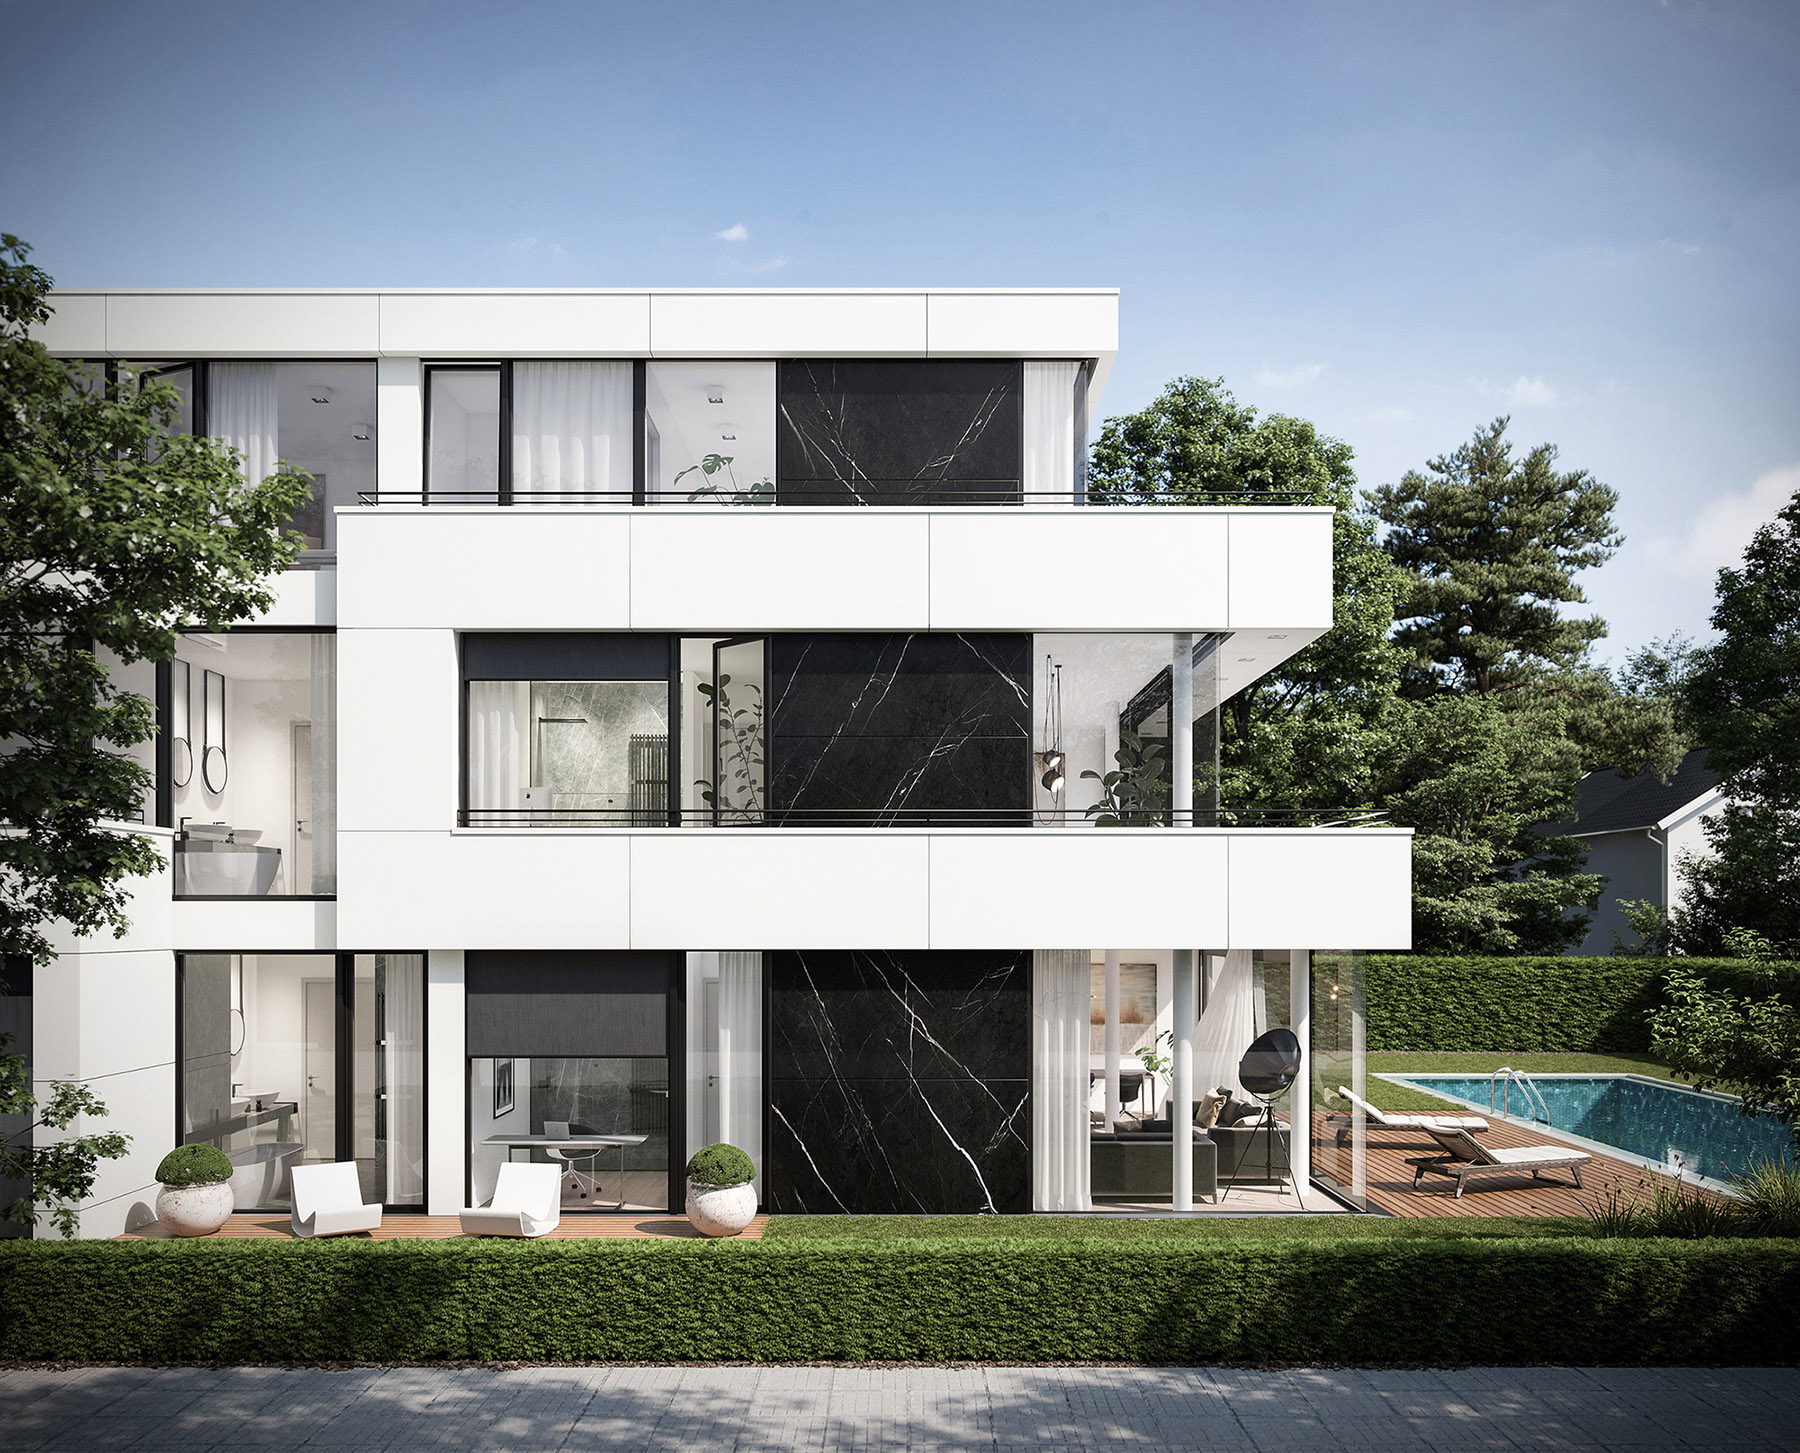 proyecto vivienda exterior 01